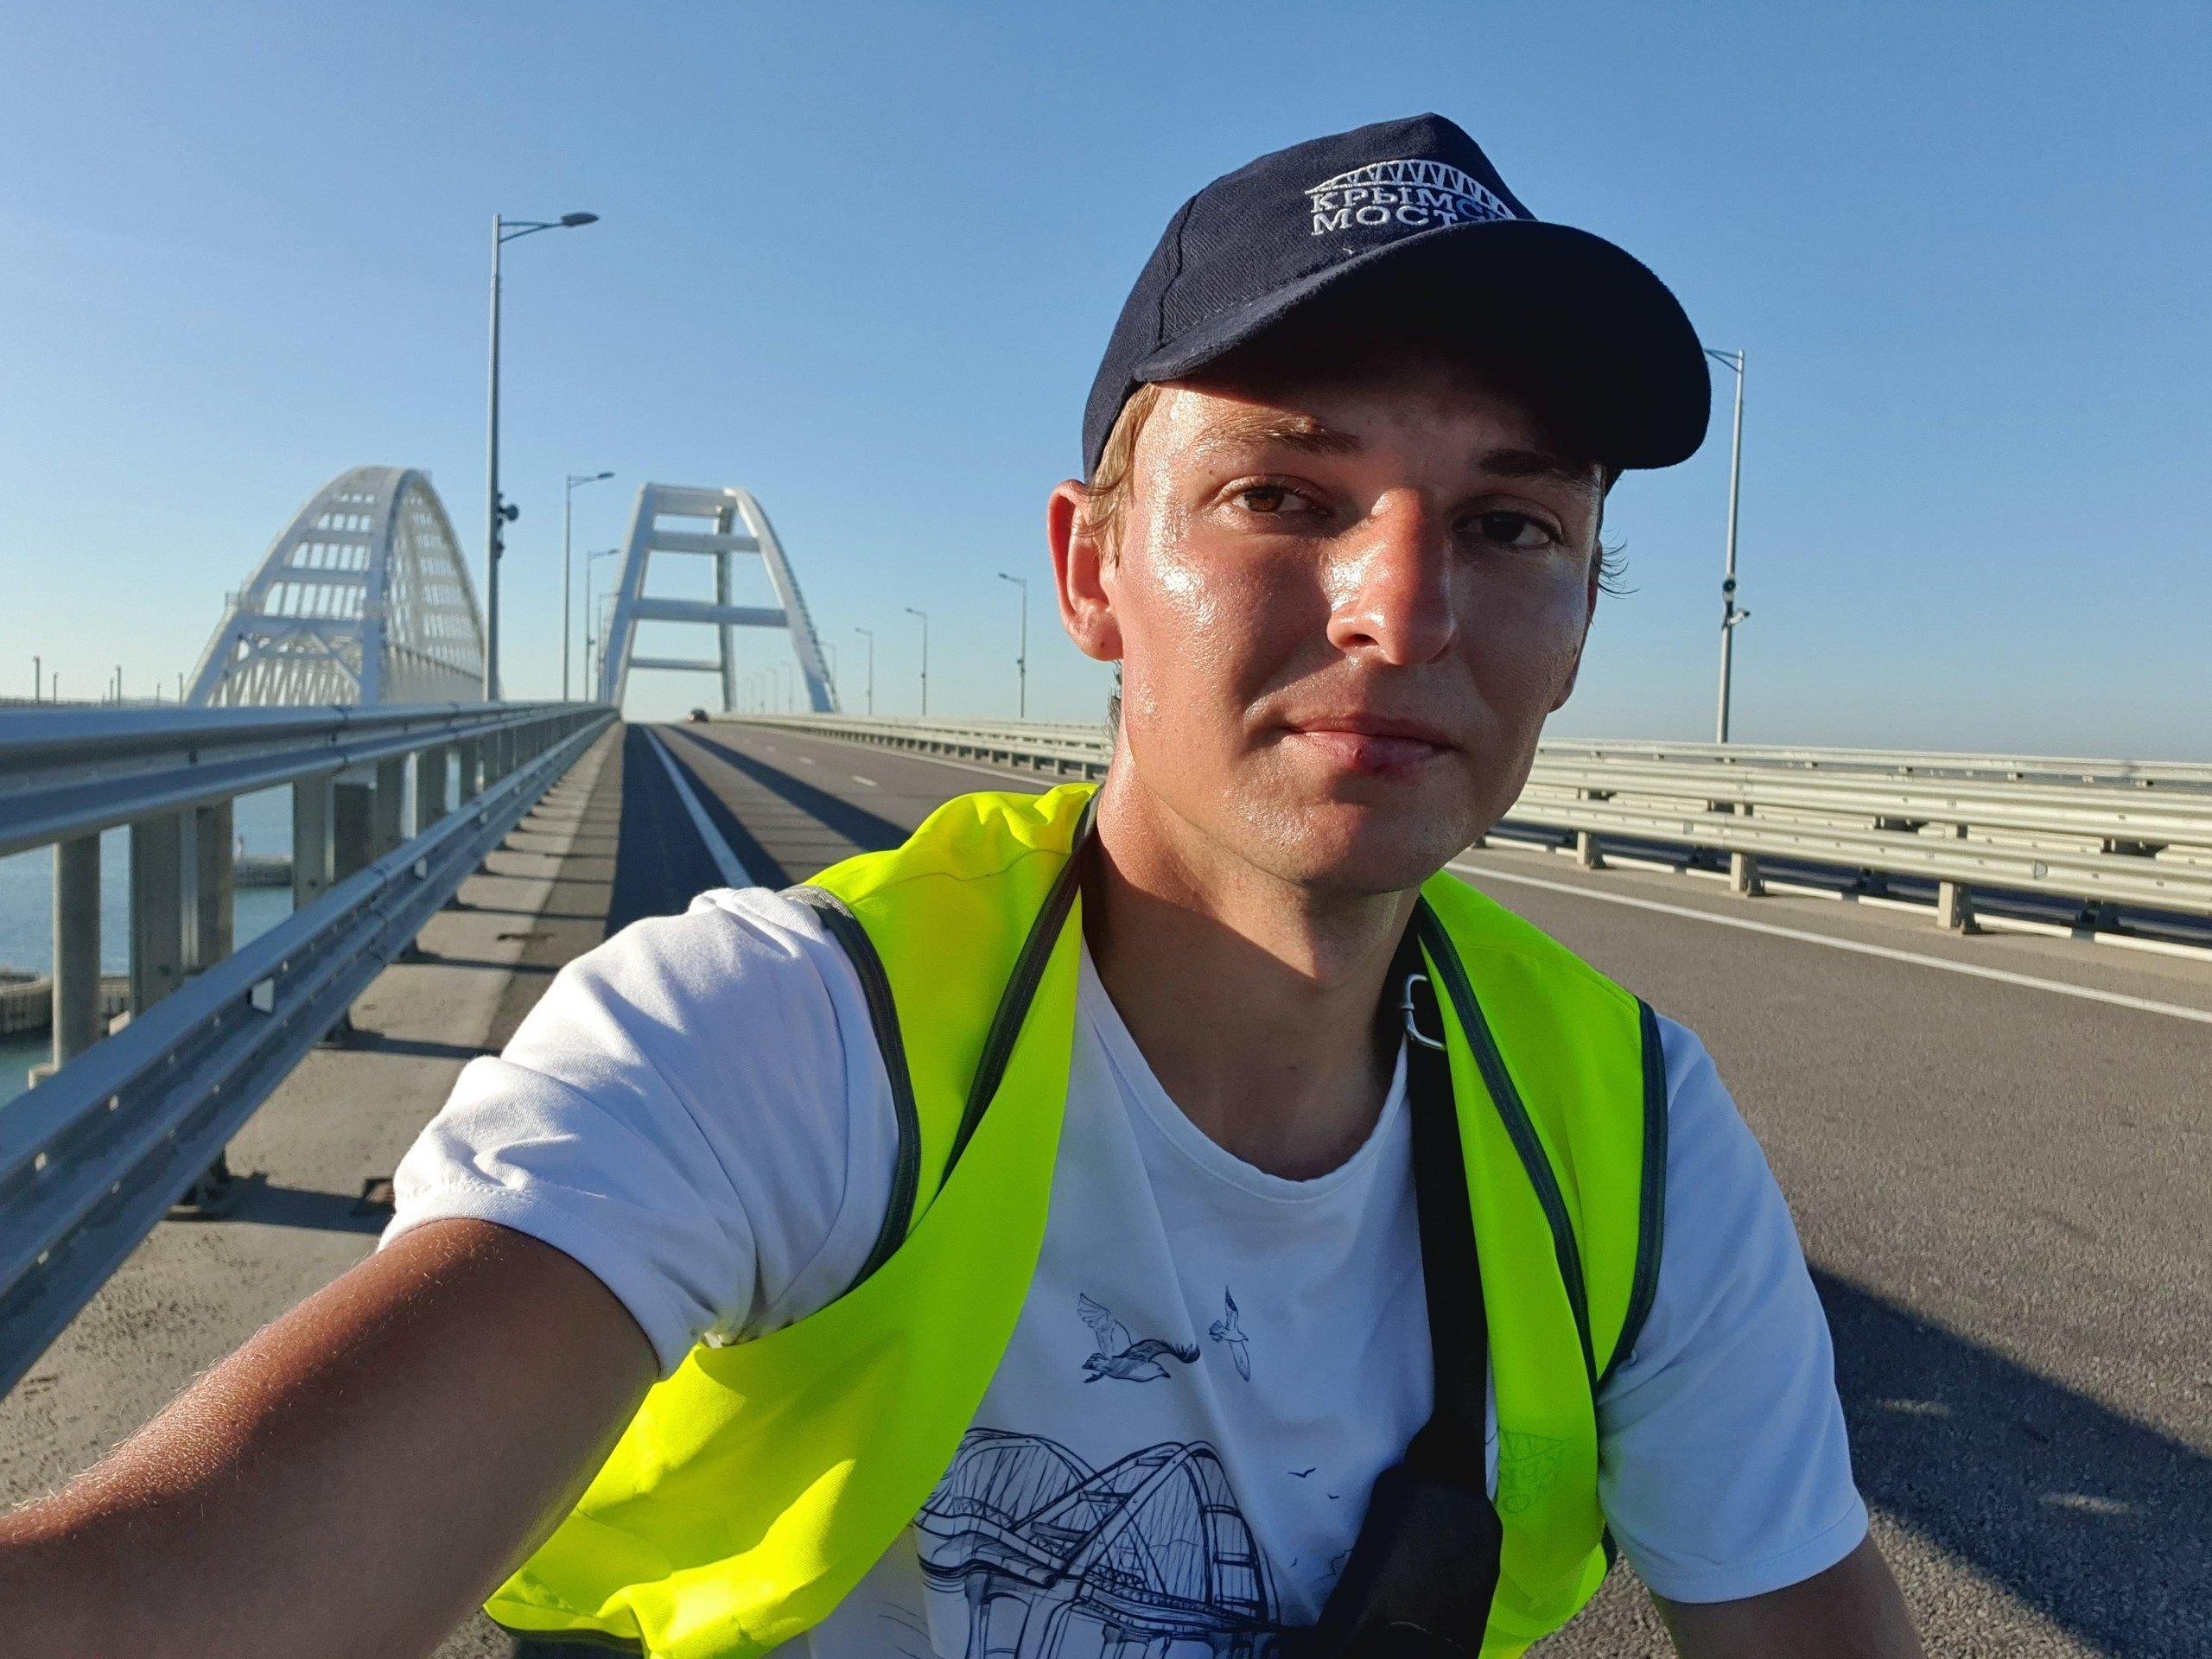 Александр Долгополов на Крымском мосту